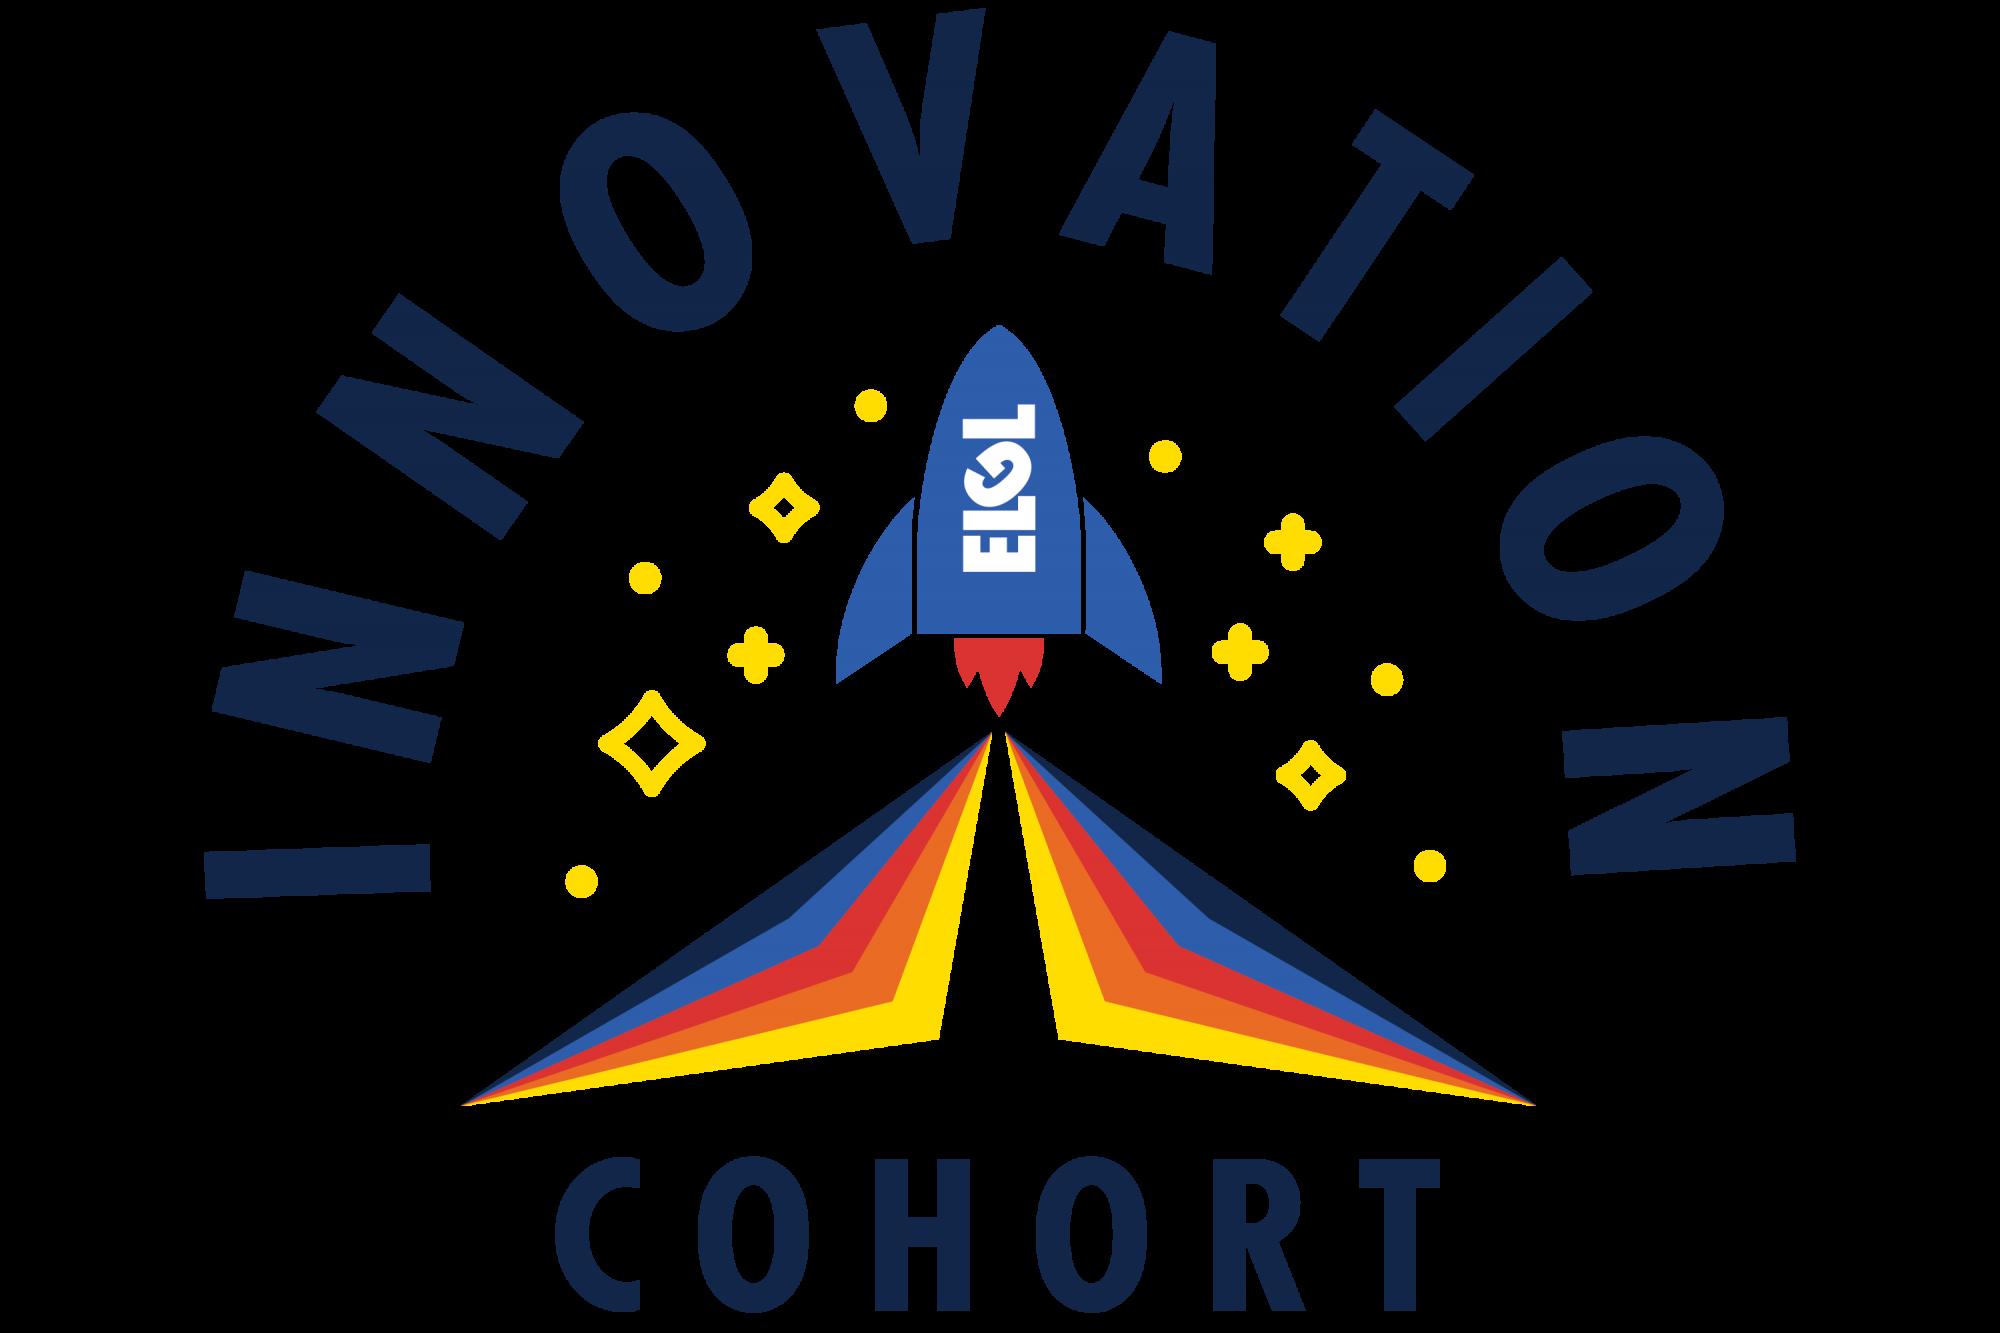 Innovation Cohort Transparent